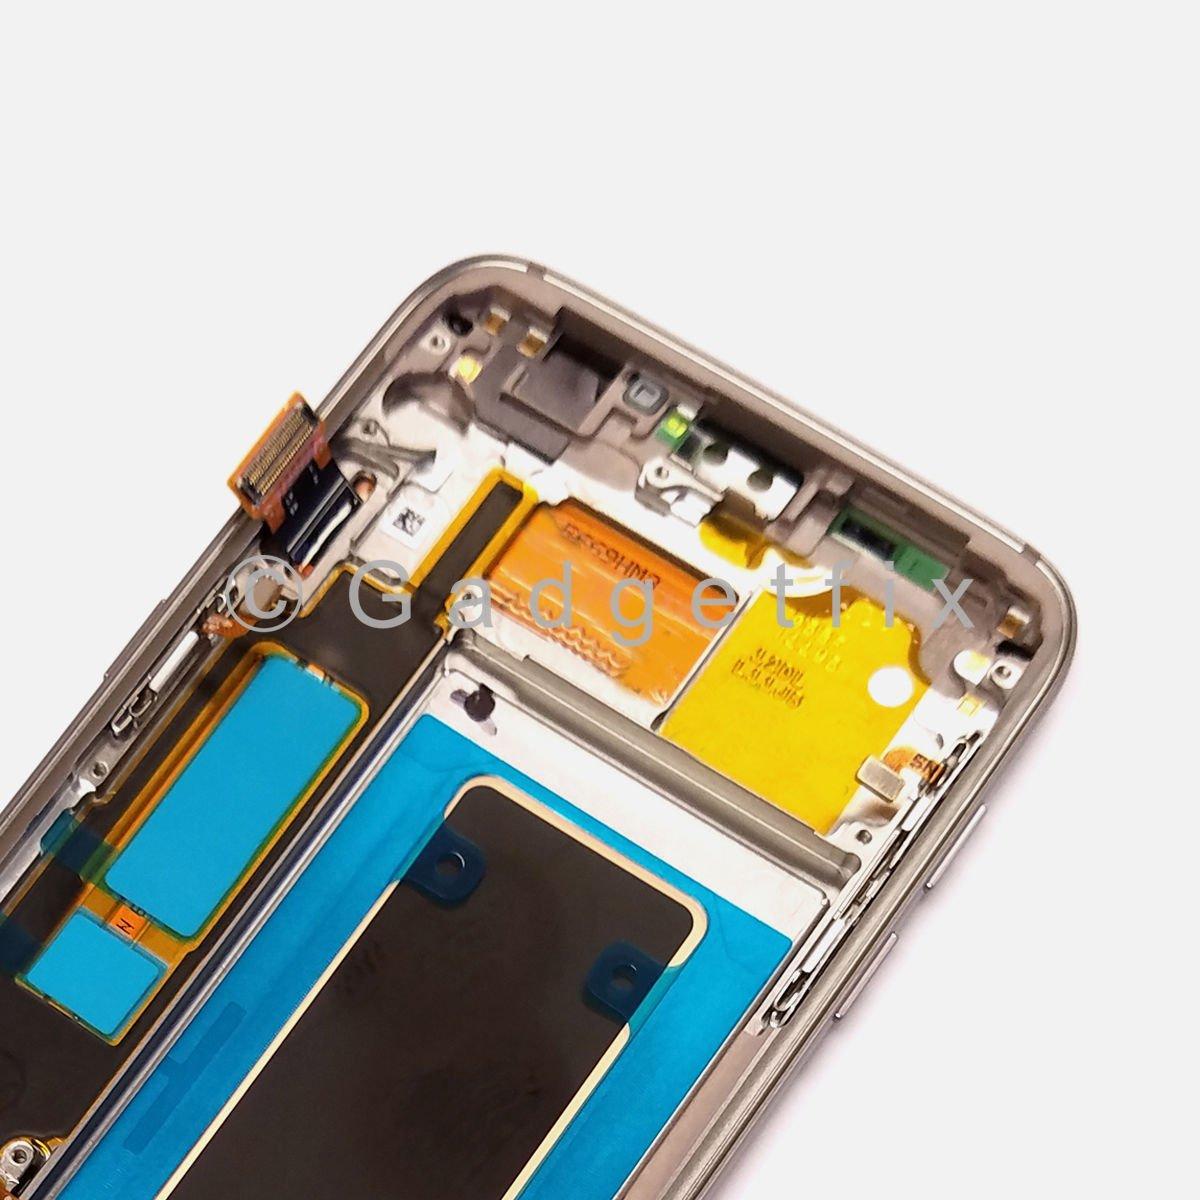 Gold Samsung Galaxy S7 Edge G935v G935p G935a G935t Lcd Display G935 Touch Screen Digitizer Frame 351787803568